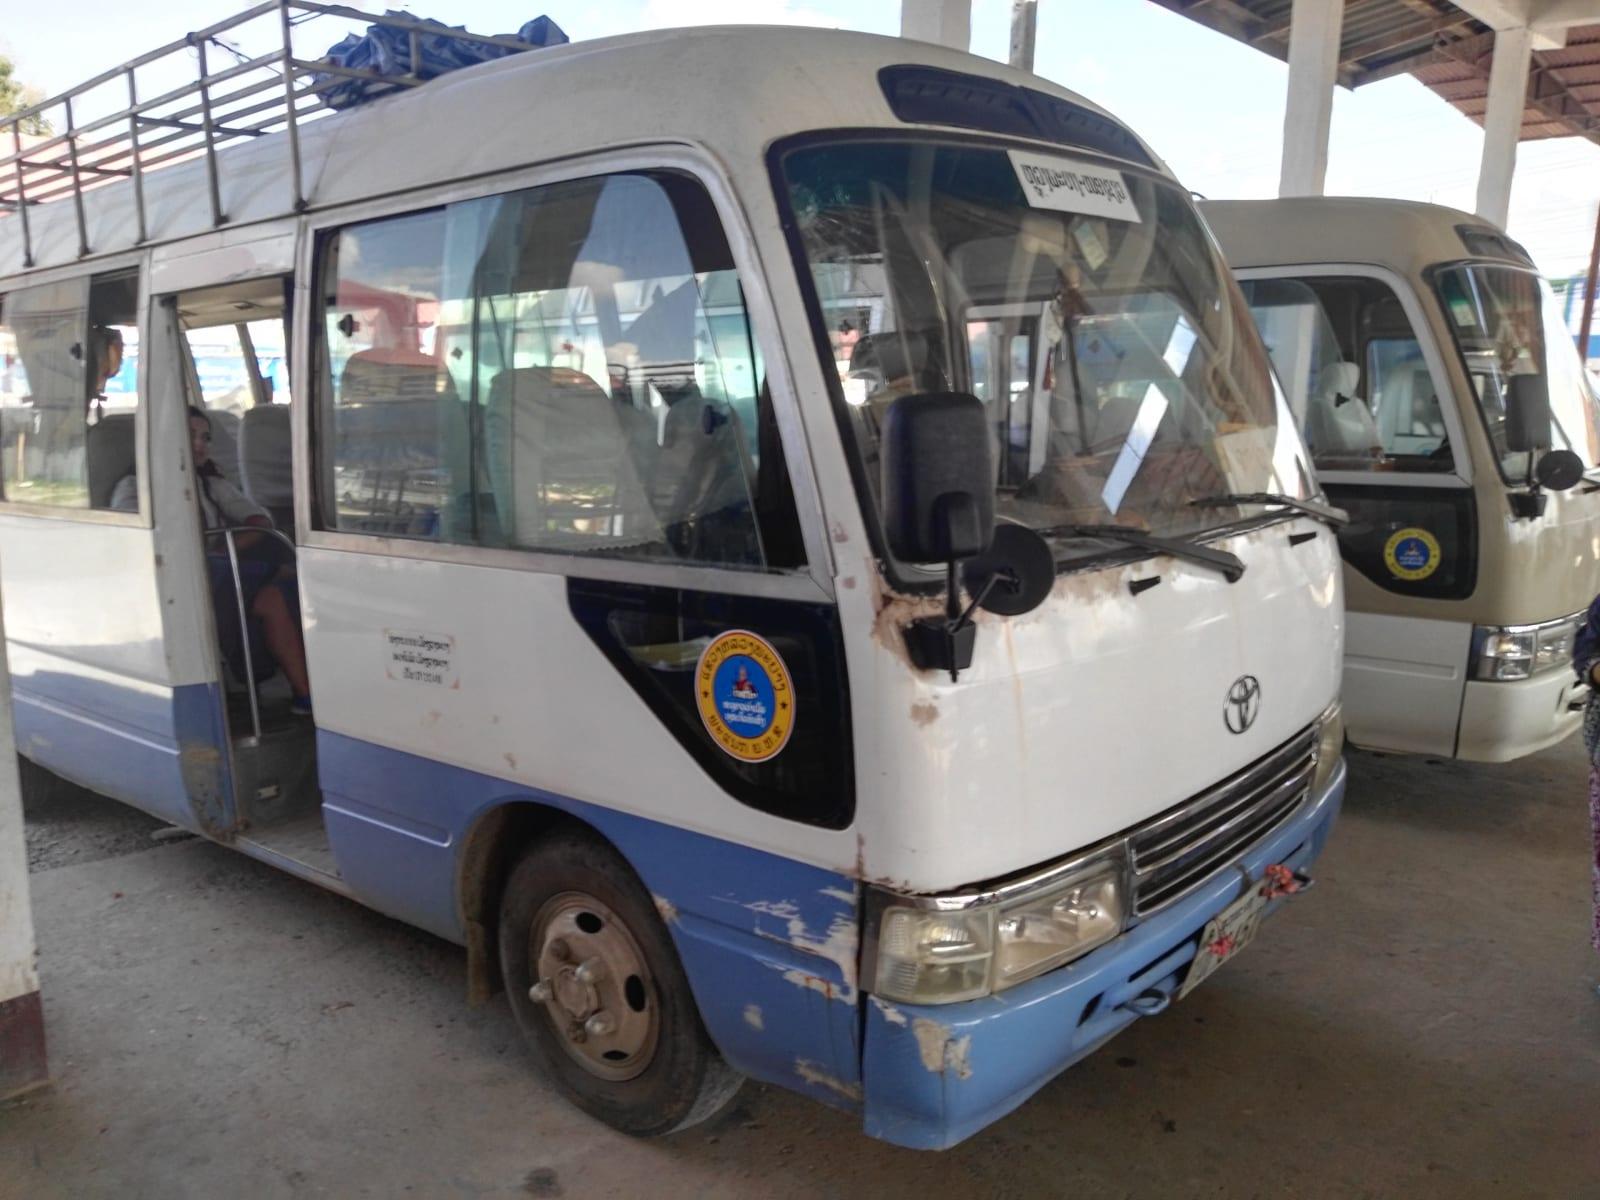 Autobus z Luang Prabang do Nong Khiaw, Laos